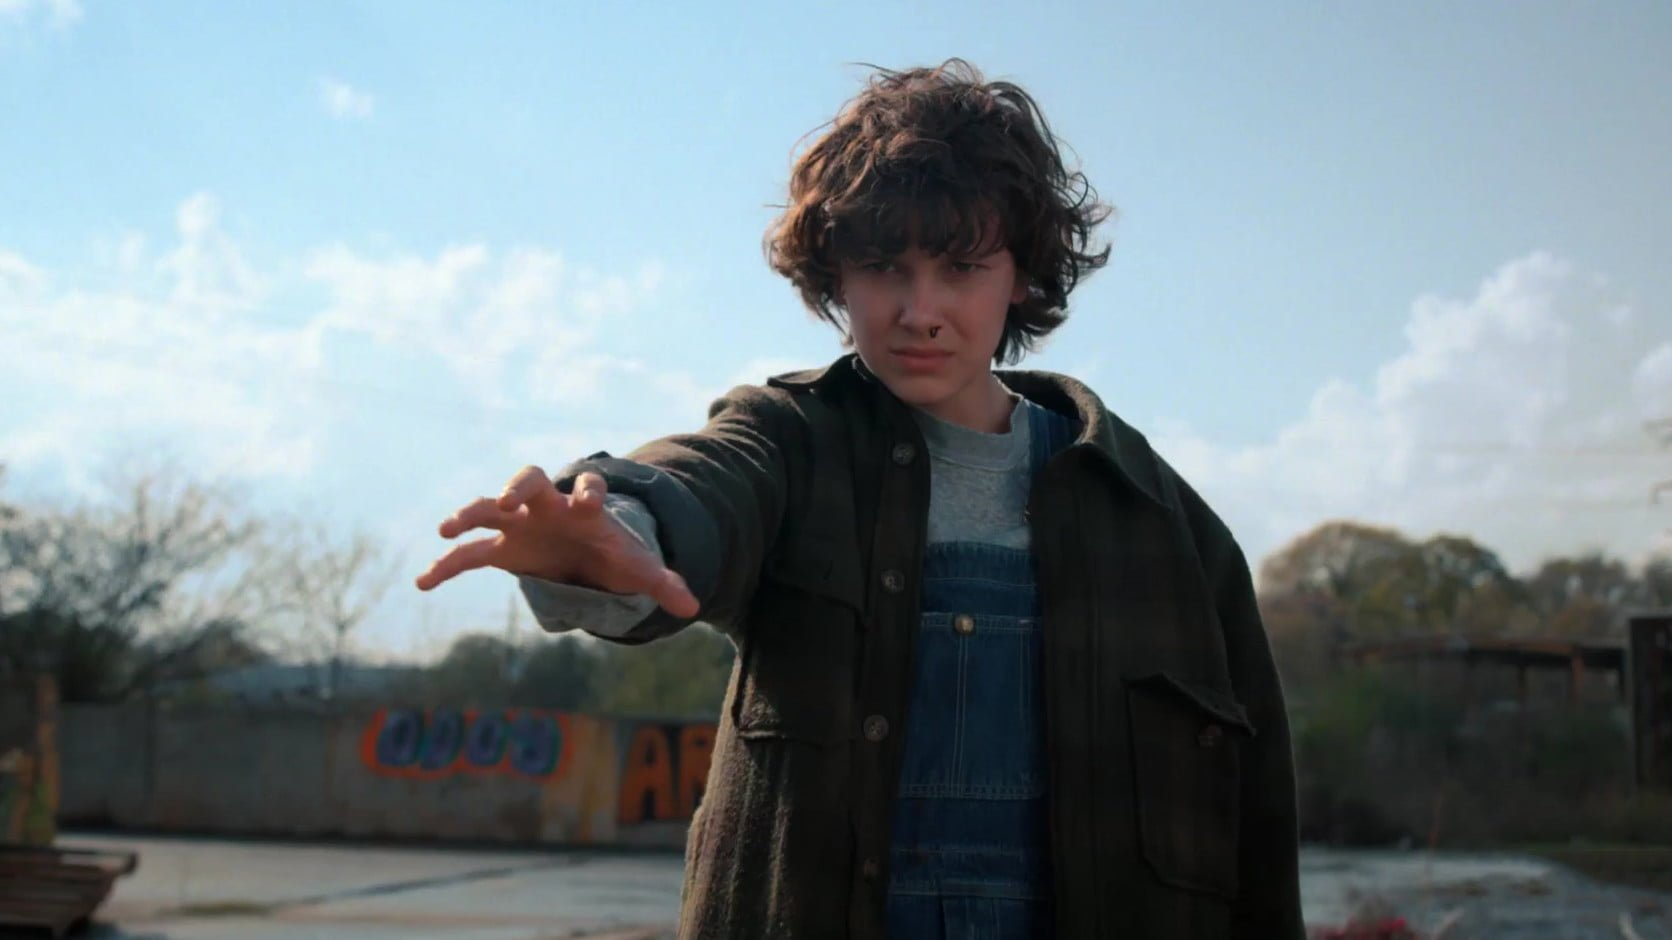 stranger-things-season-2-trailer-2-feature